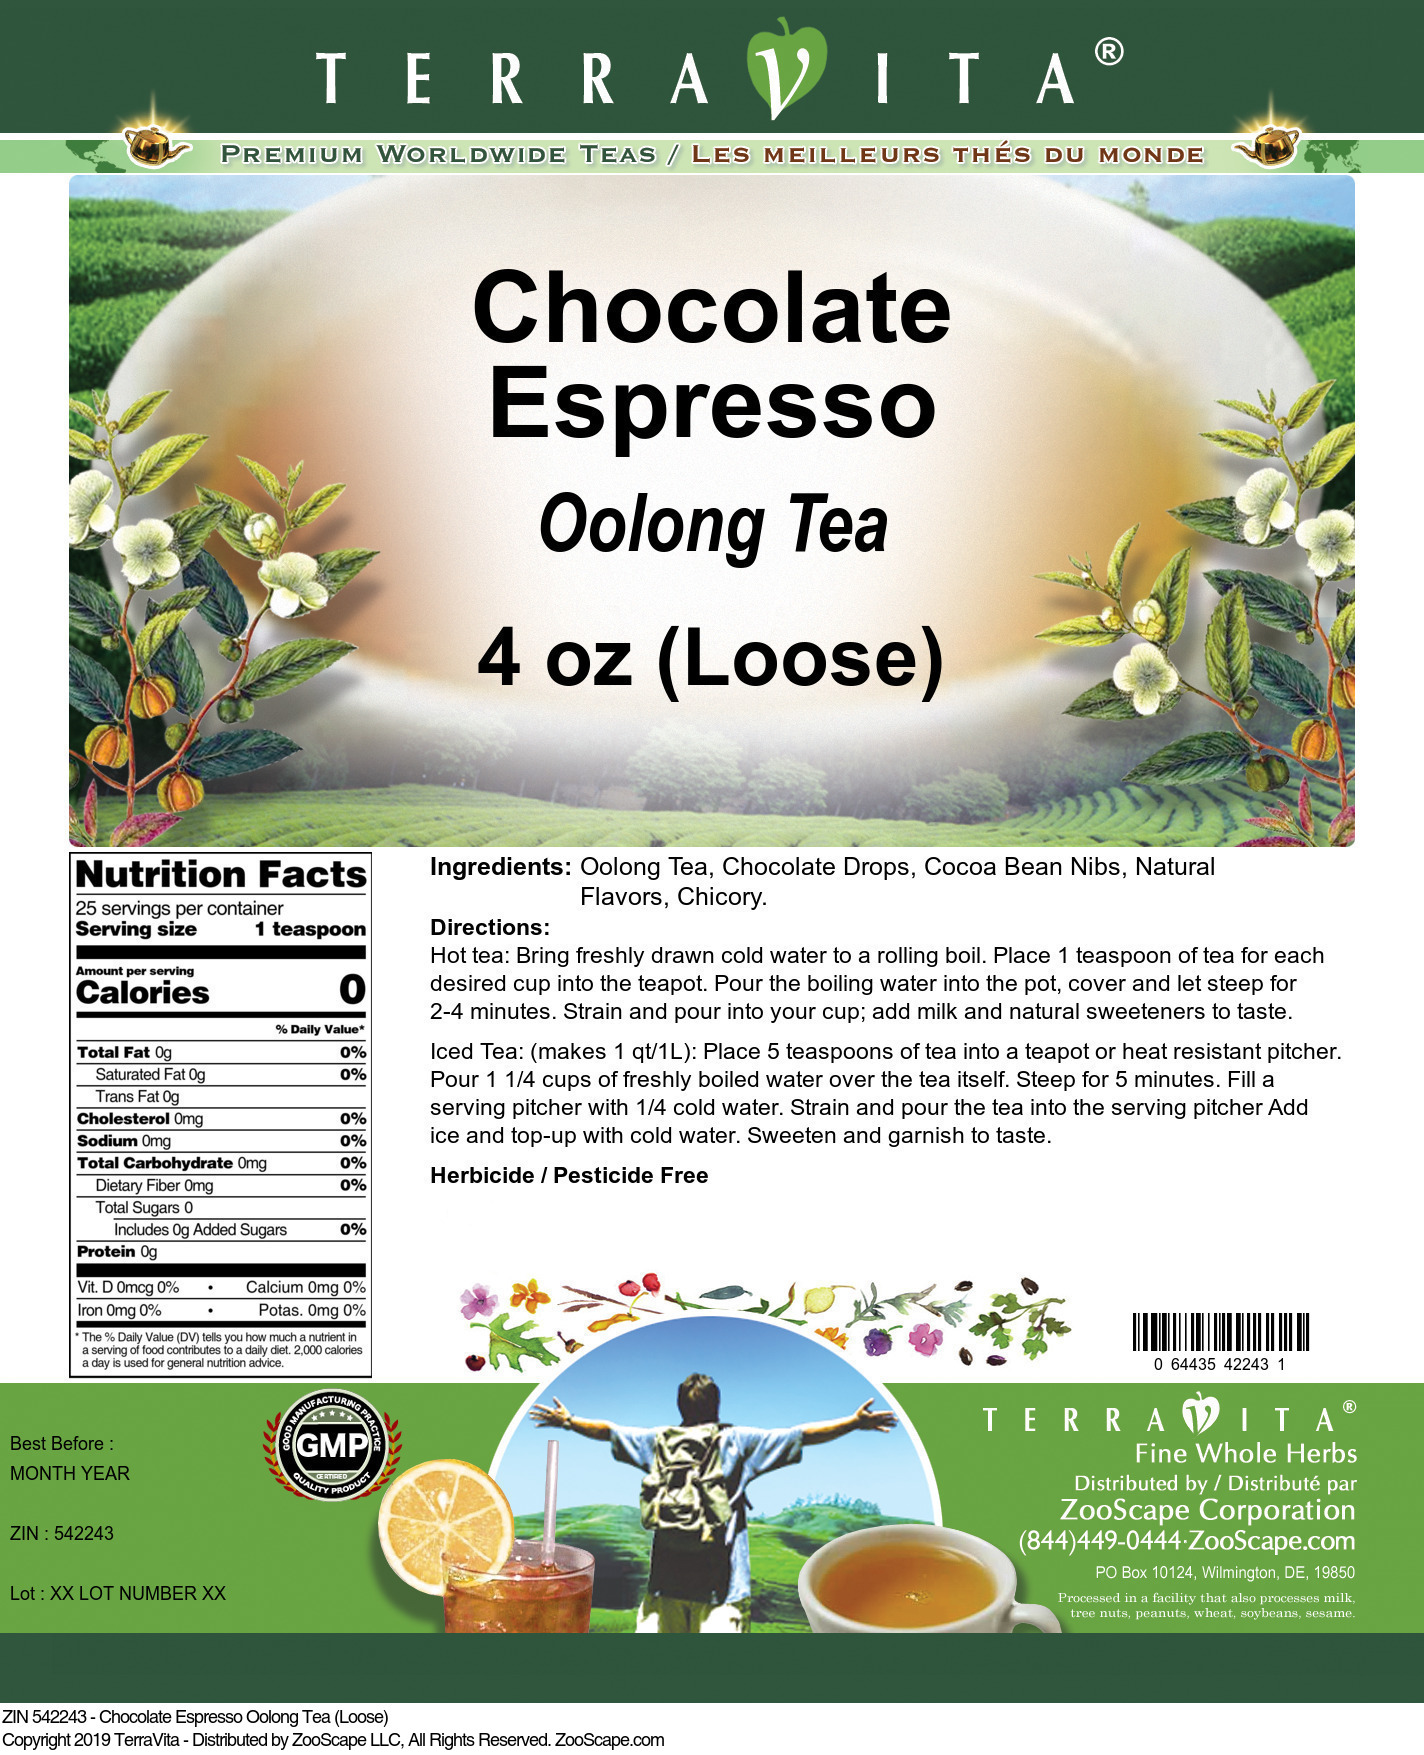 Chocolate Espresso Oolong Tea (Loose)